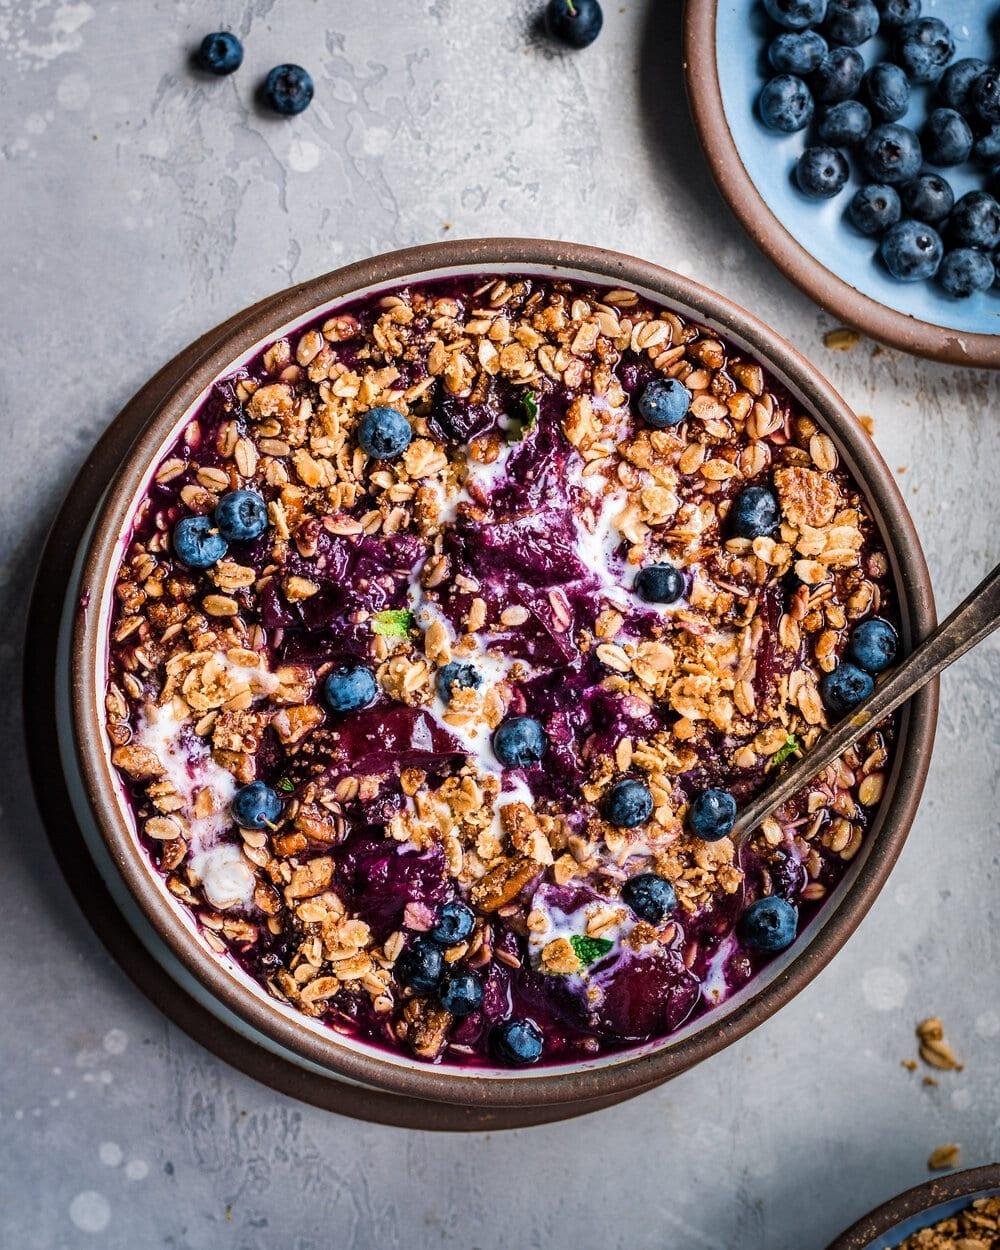 Vegan Instant Pot Nectarine Berry Crisp